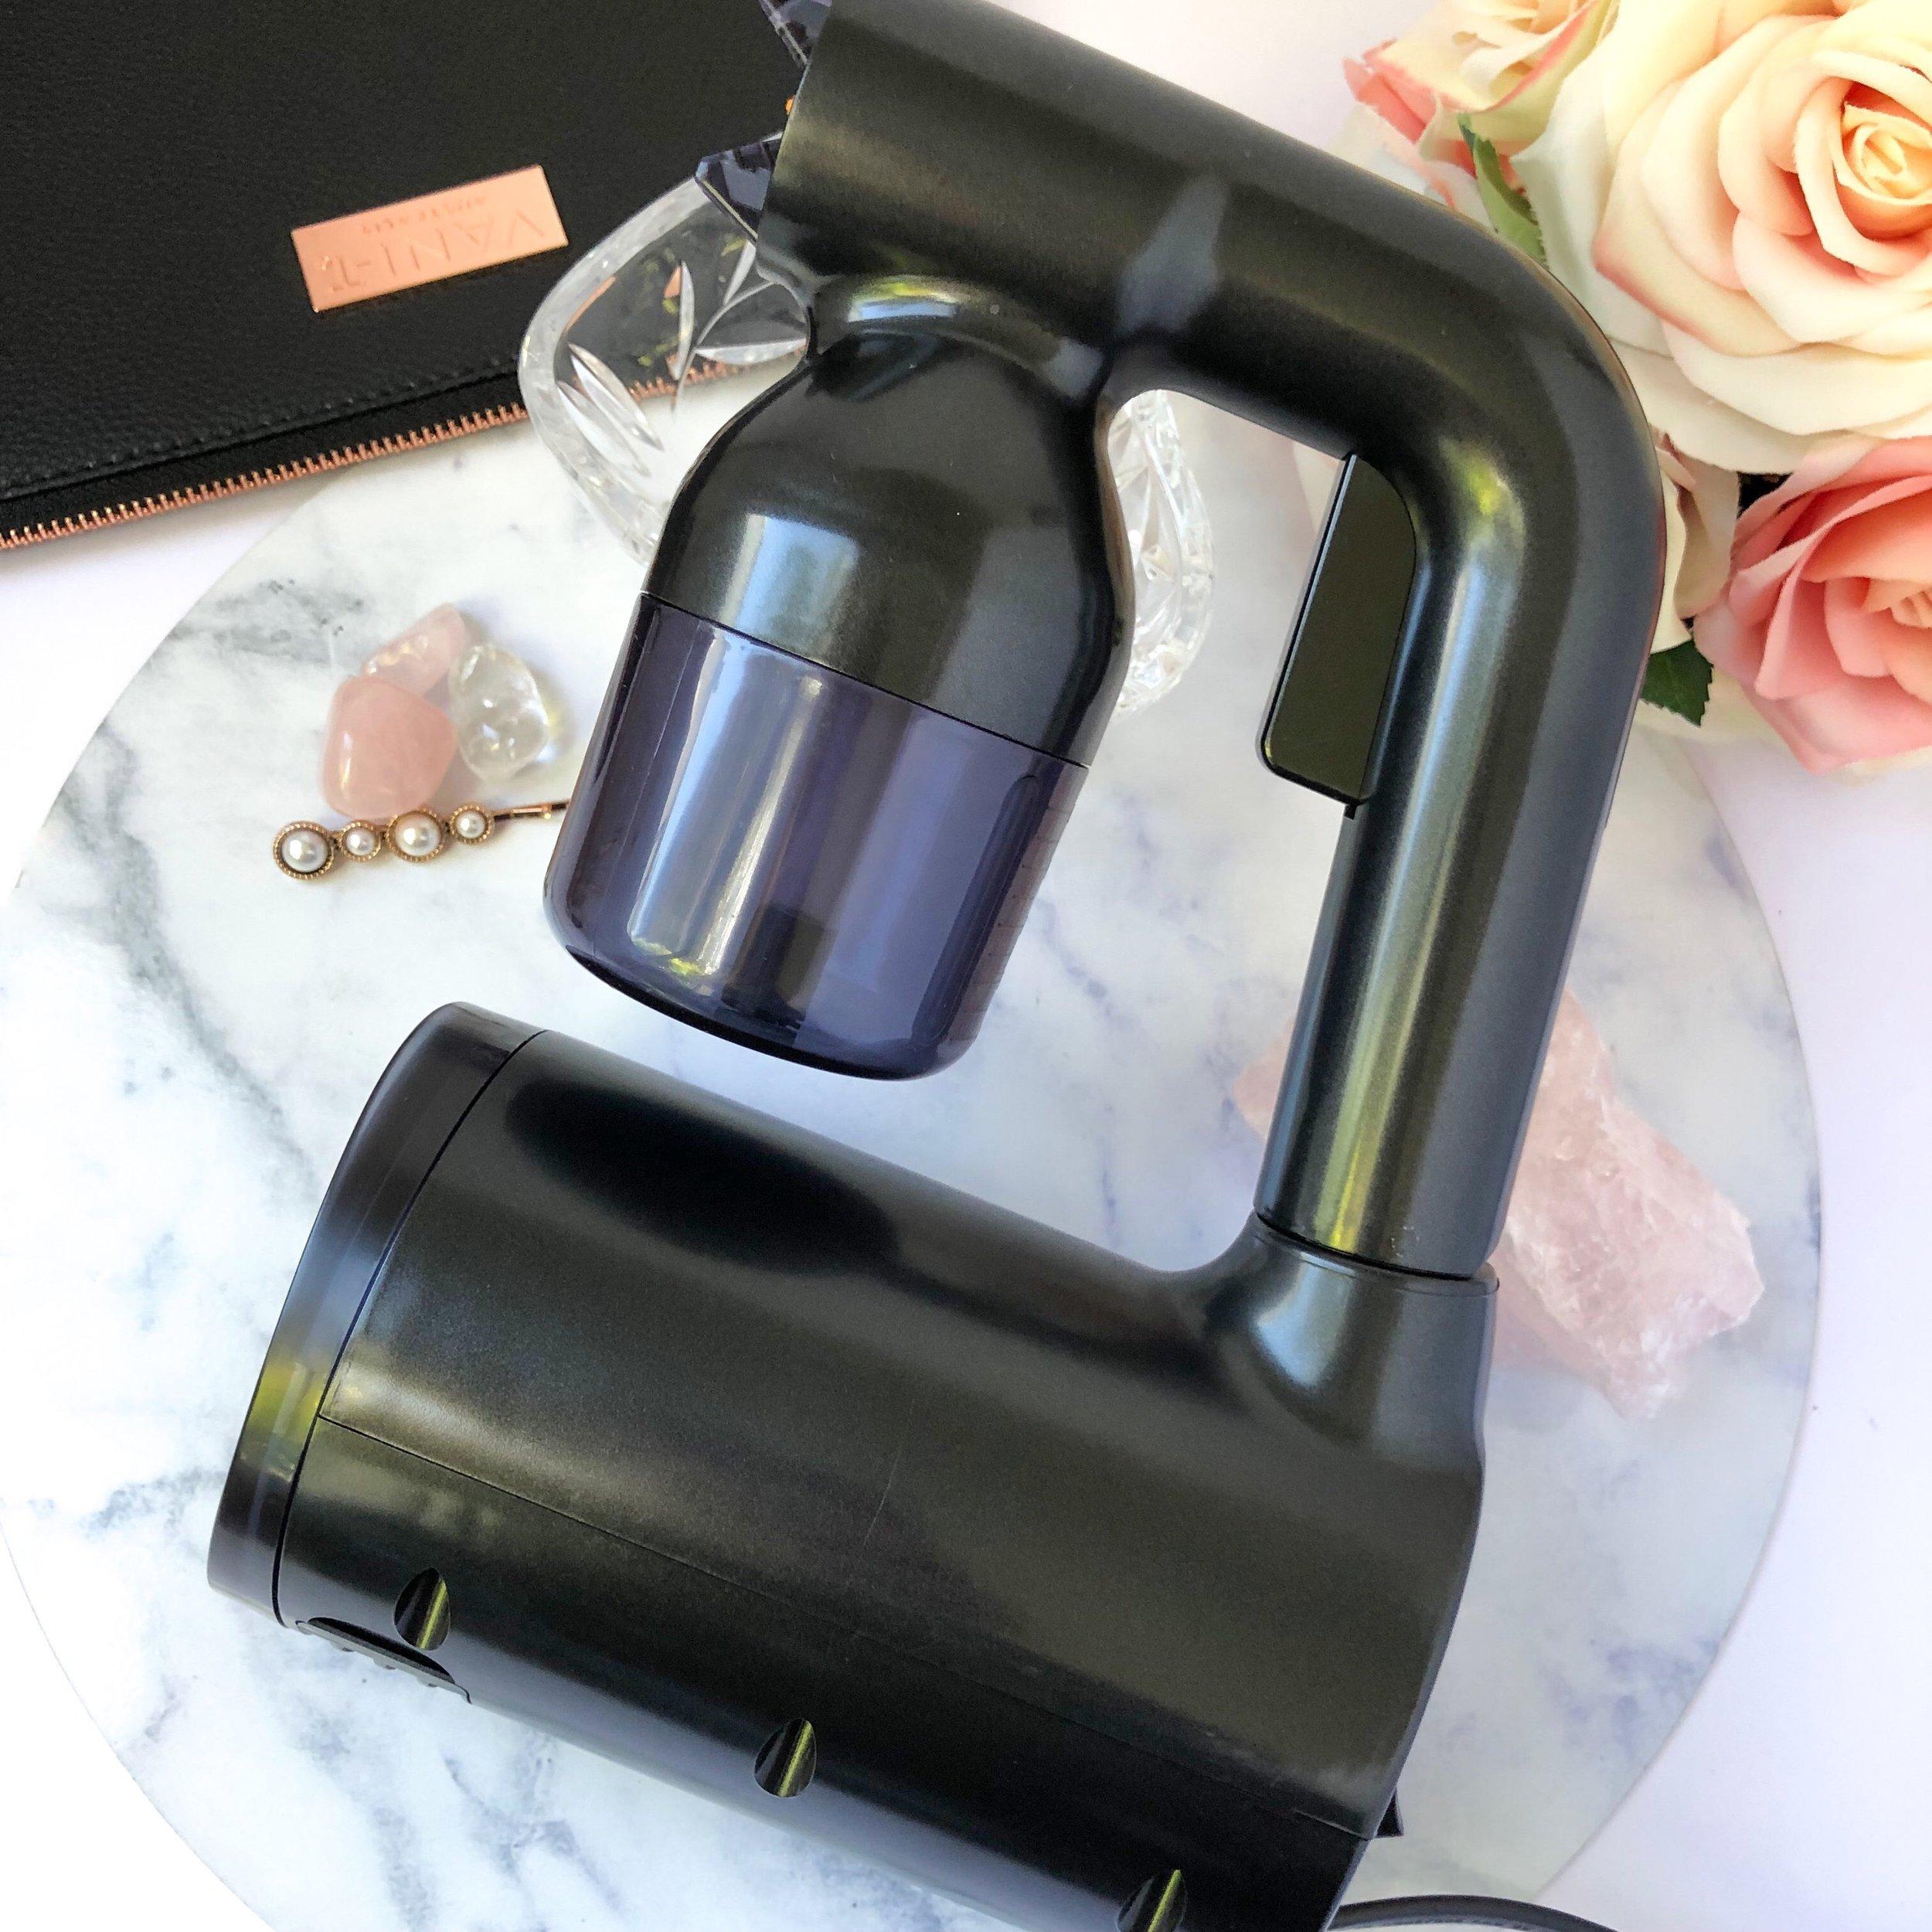 Personal Spray Tanning System.jpg